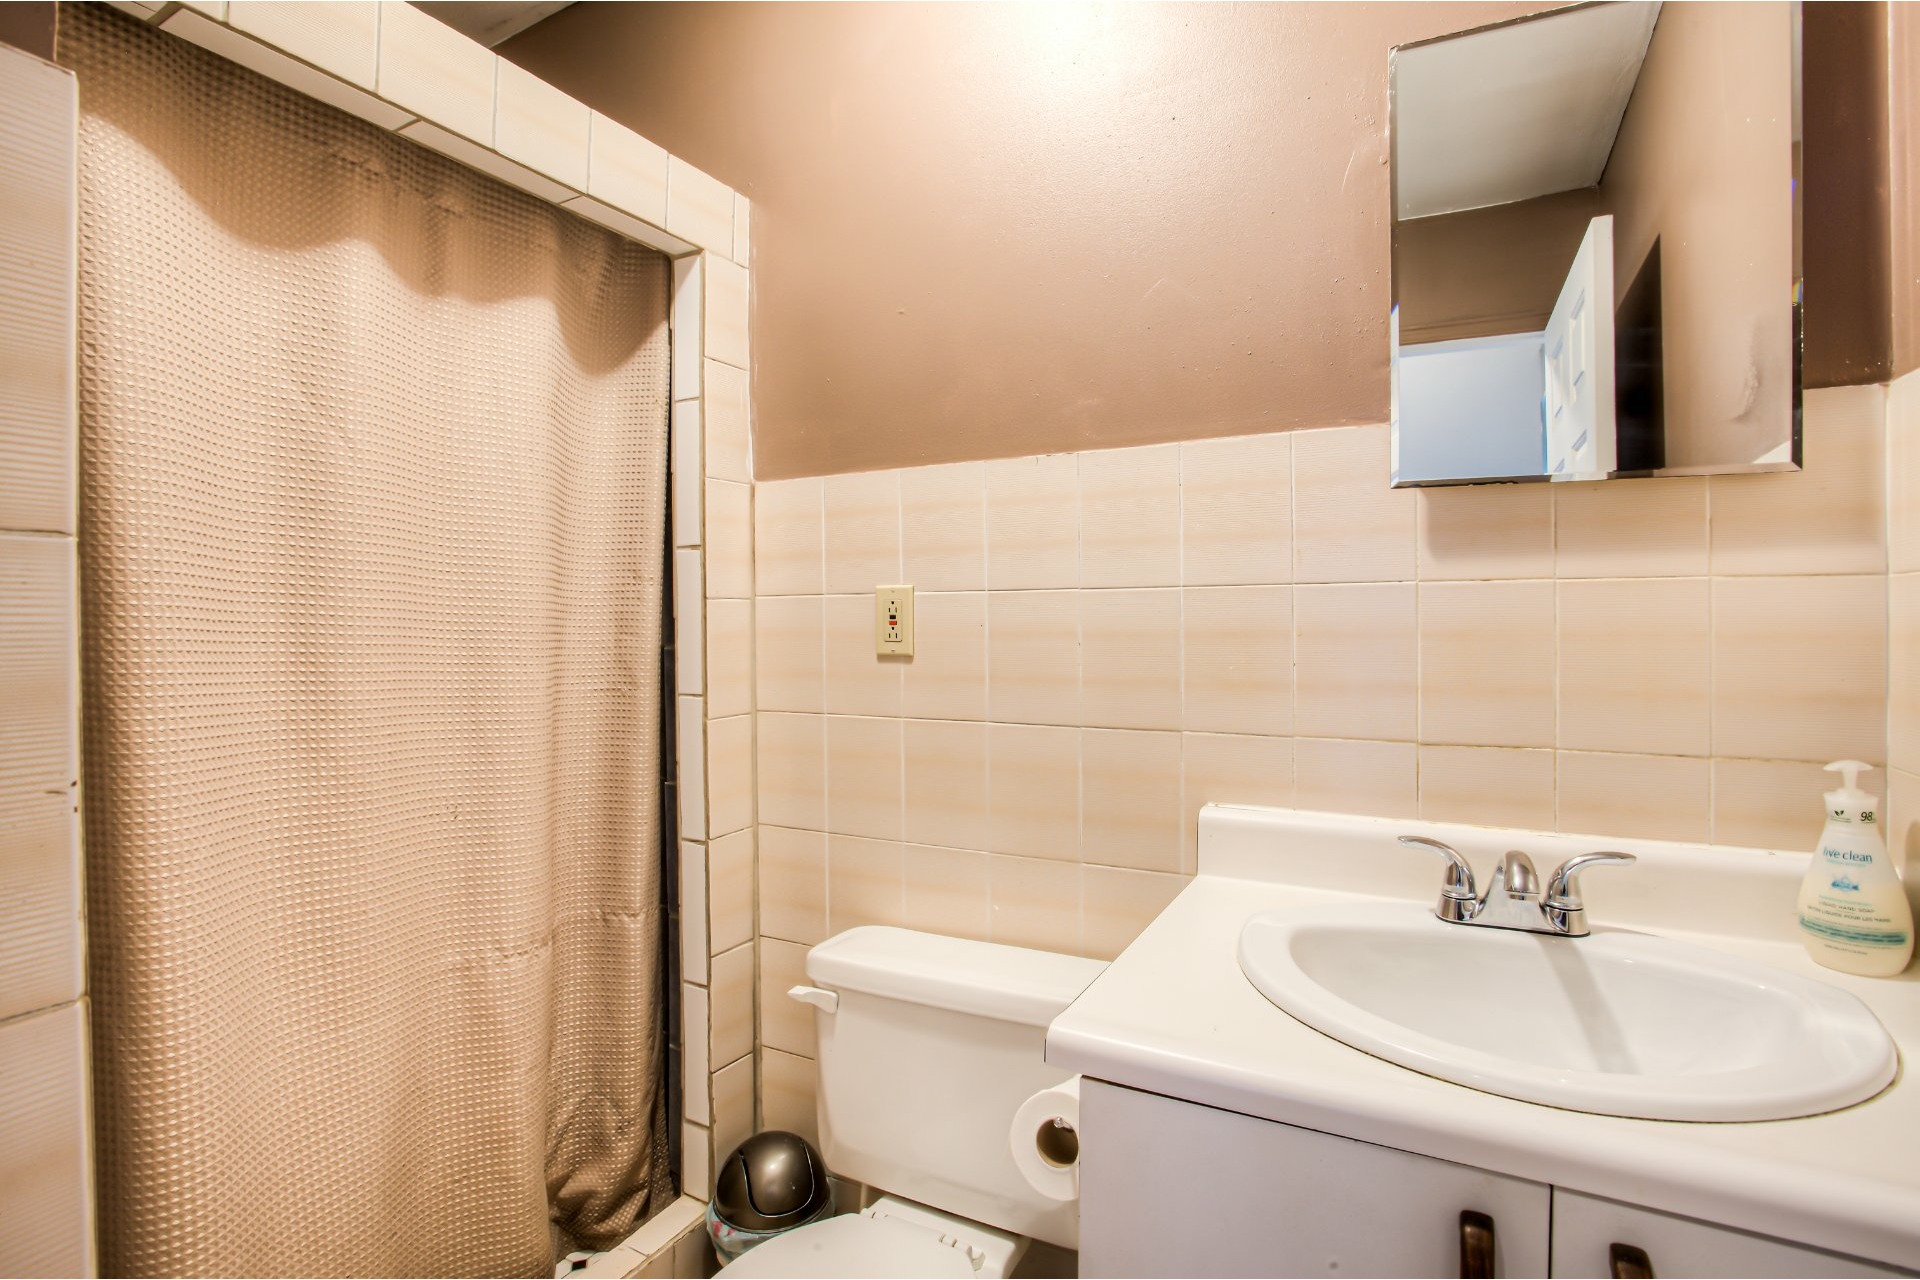 image 10 - House For sale Pierrefonds-Roxboro Montréal  - 8 rooms